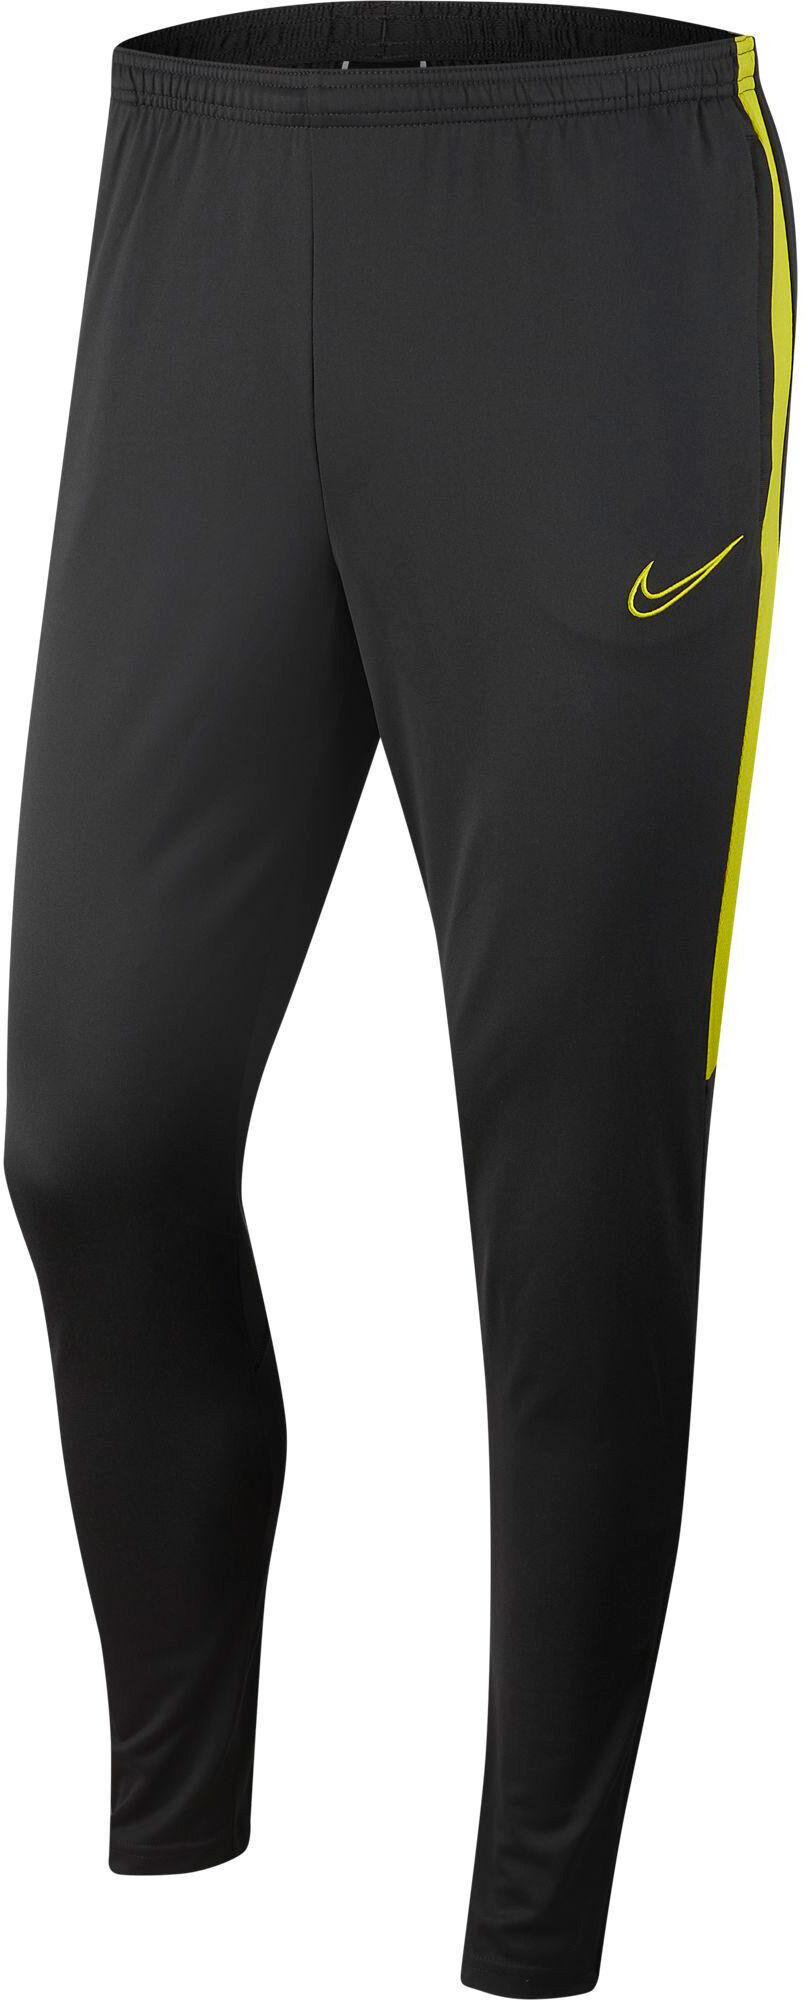 Hombre Pantalones Nike Hombre Pantalones Intersport Intersport Hombre Pantalones Intersport Nike Hombre Nike Nike Pantalones AxqaXwZgw